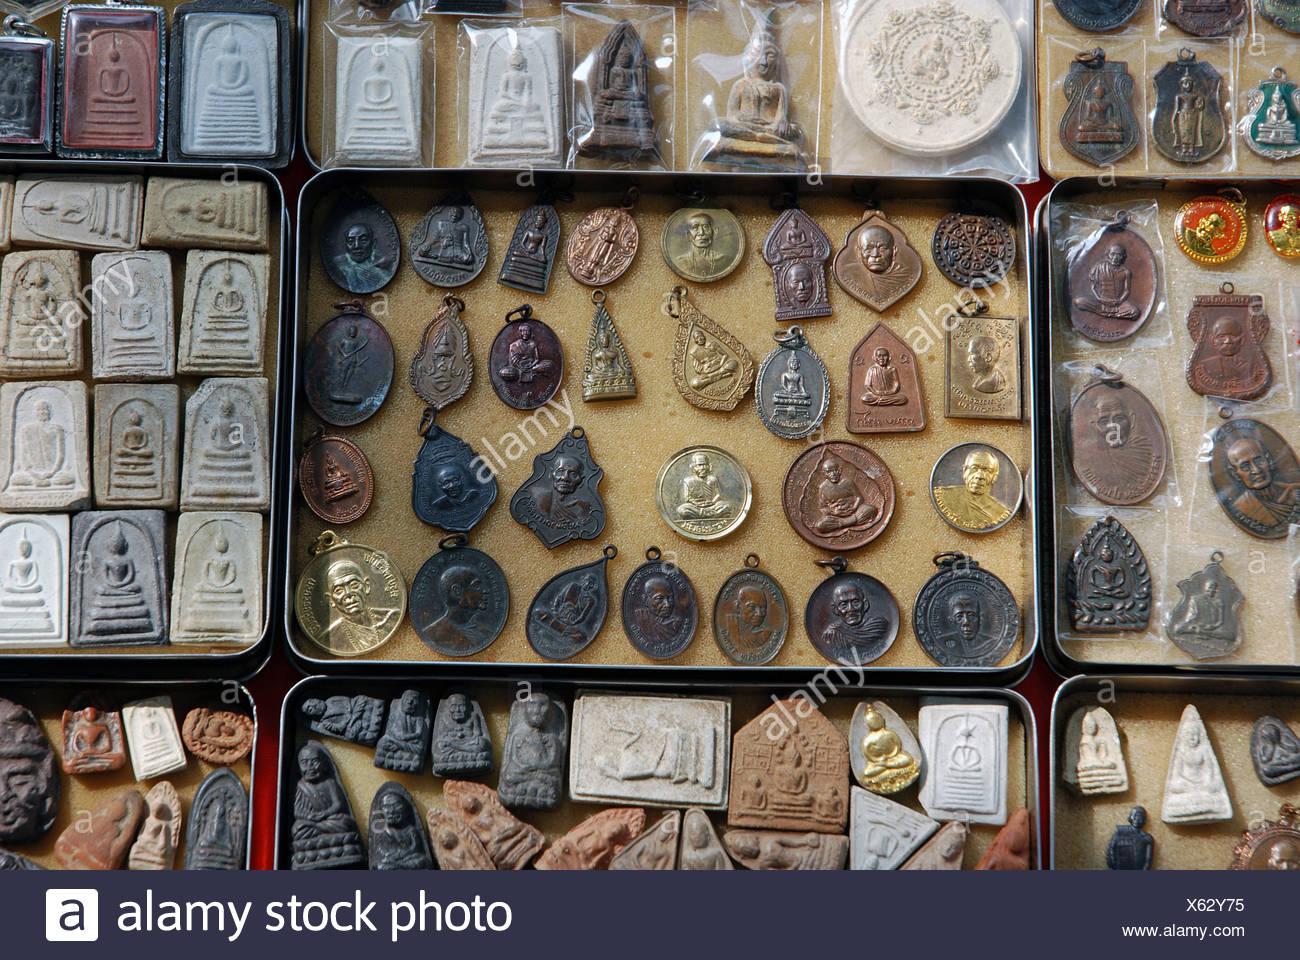 amulet Anachak Asia choice Bangkok Buddha Buddhism shopping prayer chains nonviolence belief confidence tr - Stock Image